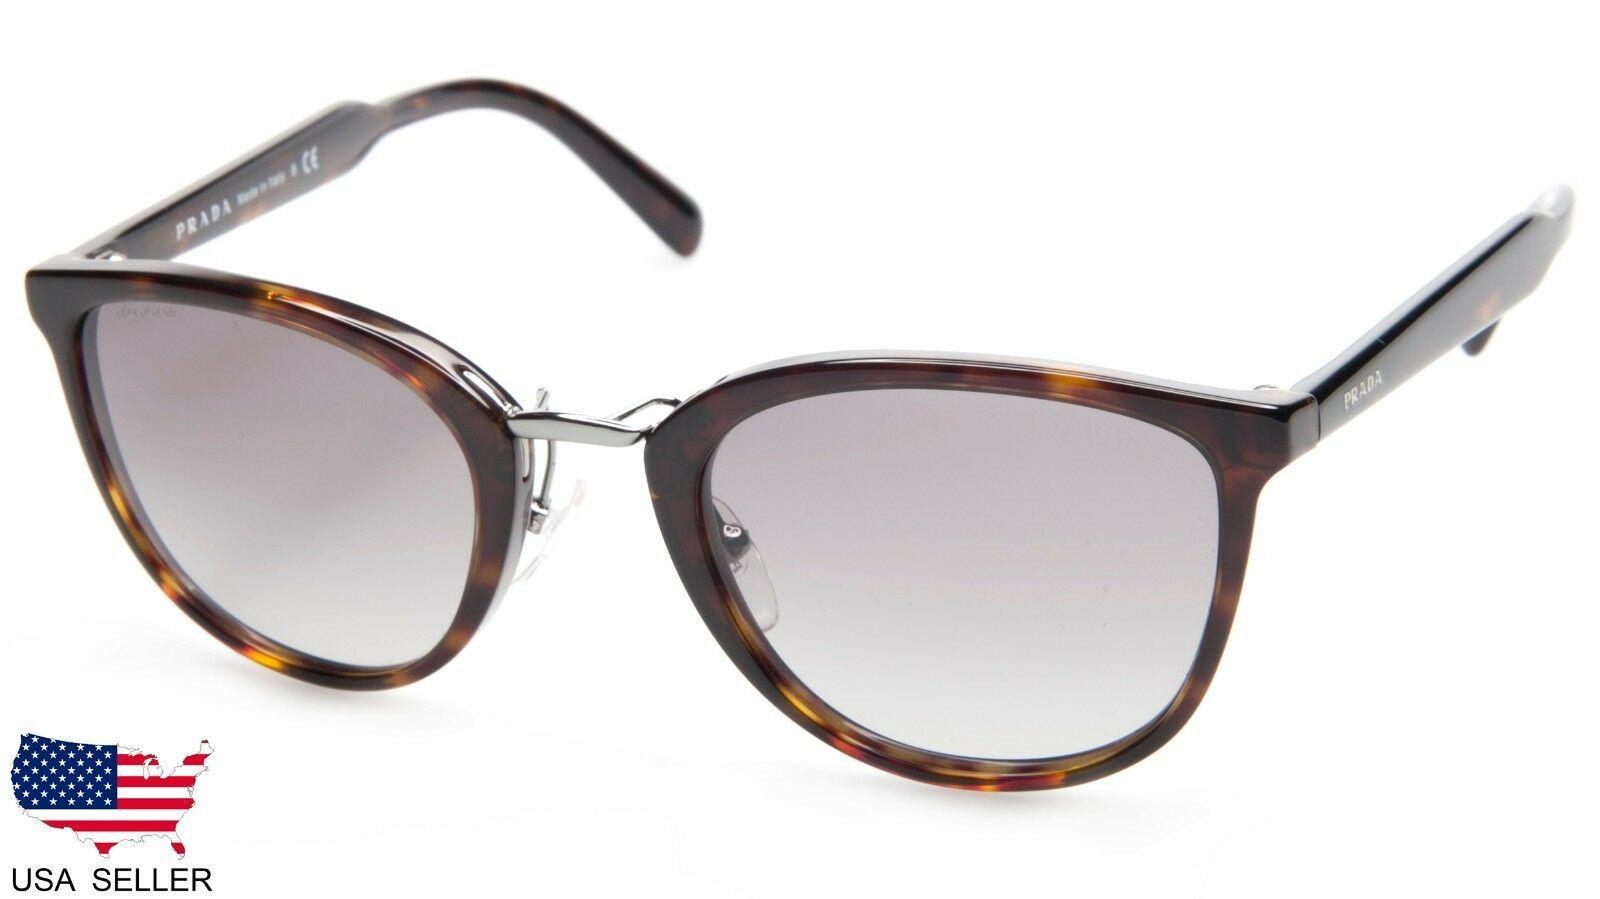 5fc5cc46 Prada Sunglasses: 1 customer review and 1272 listings